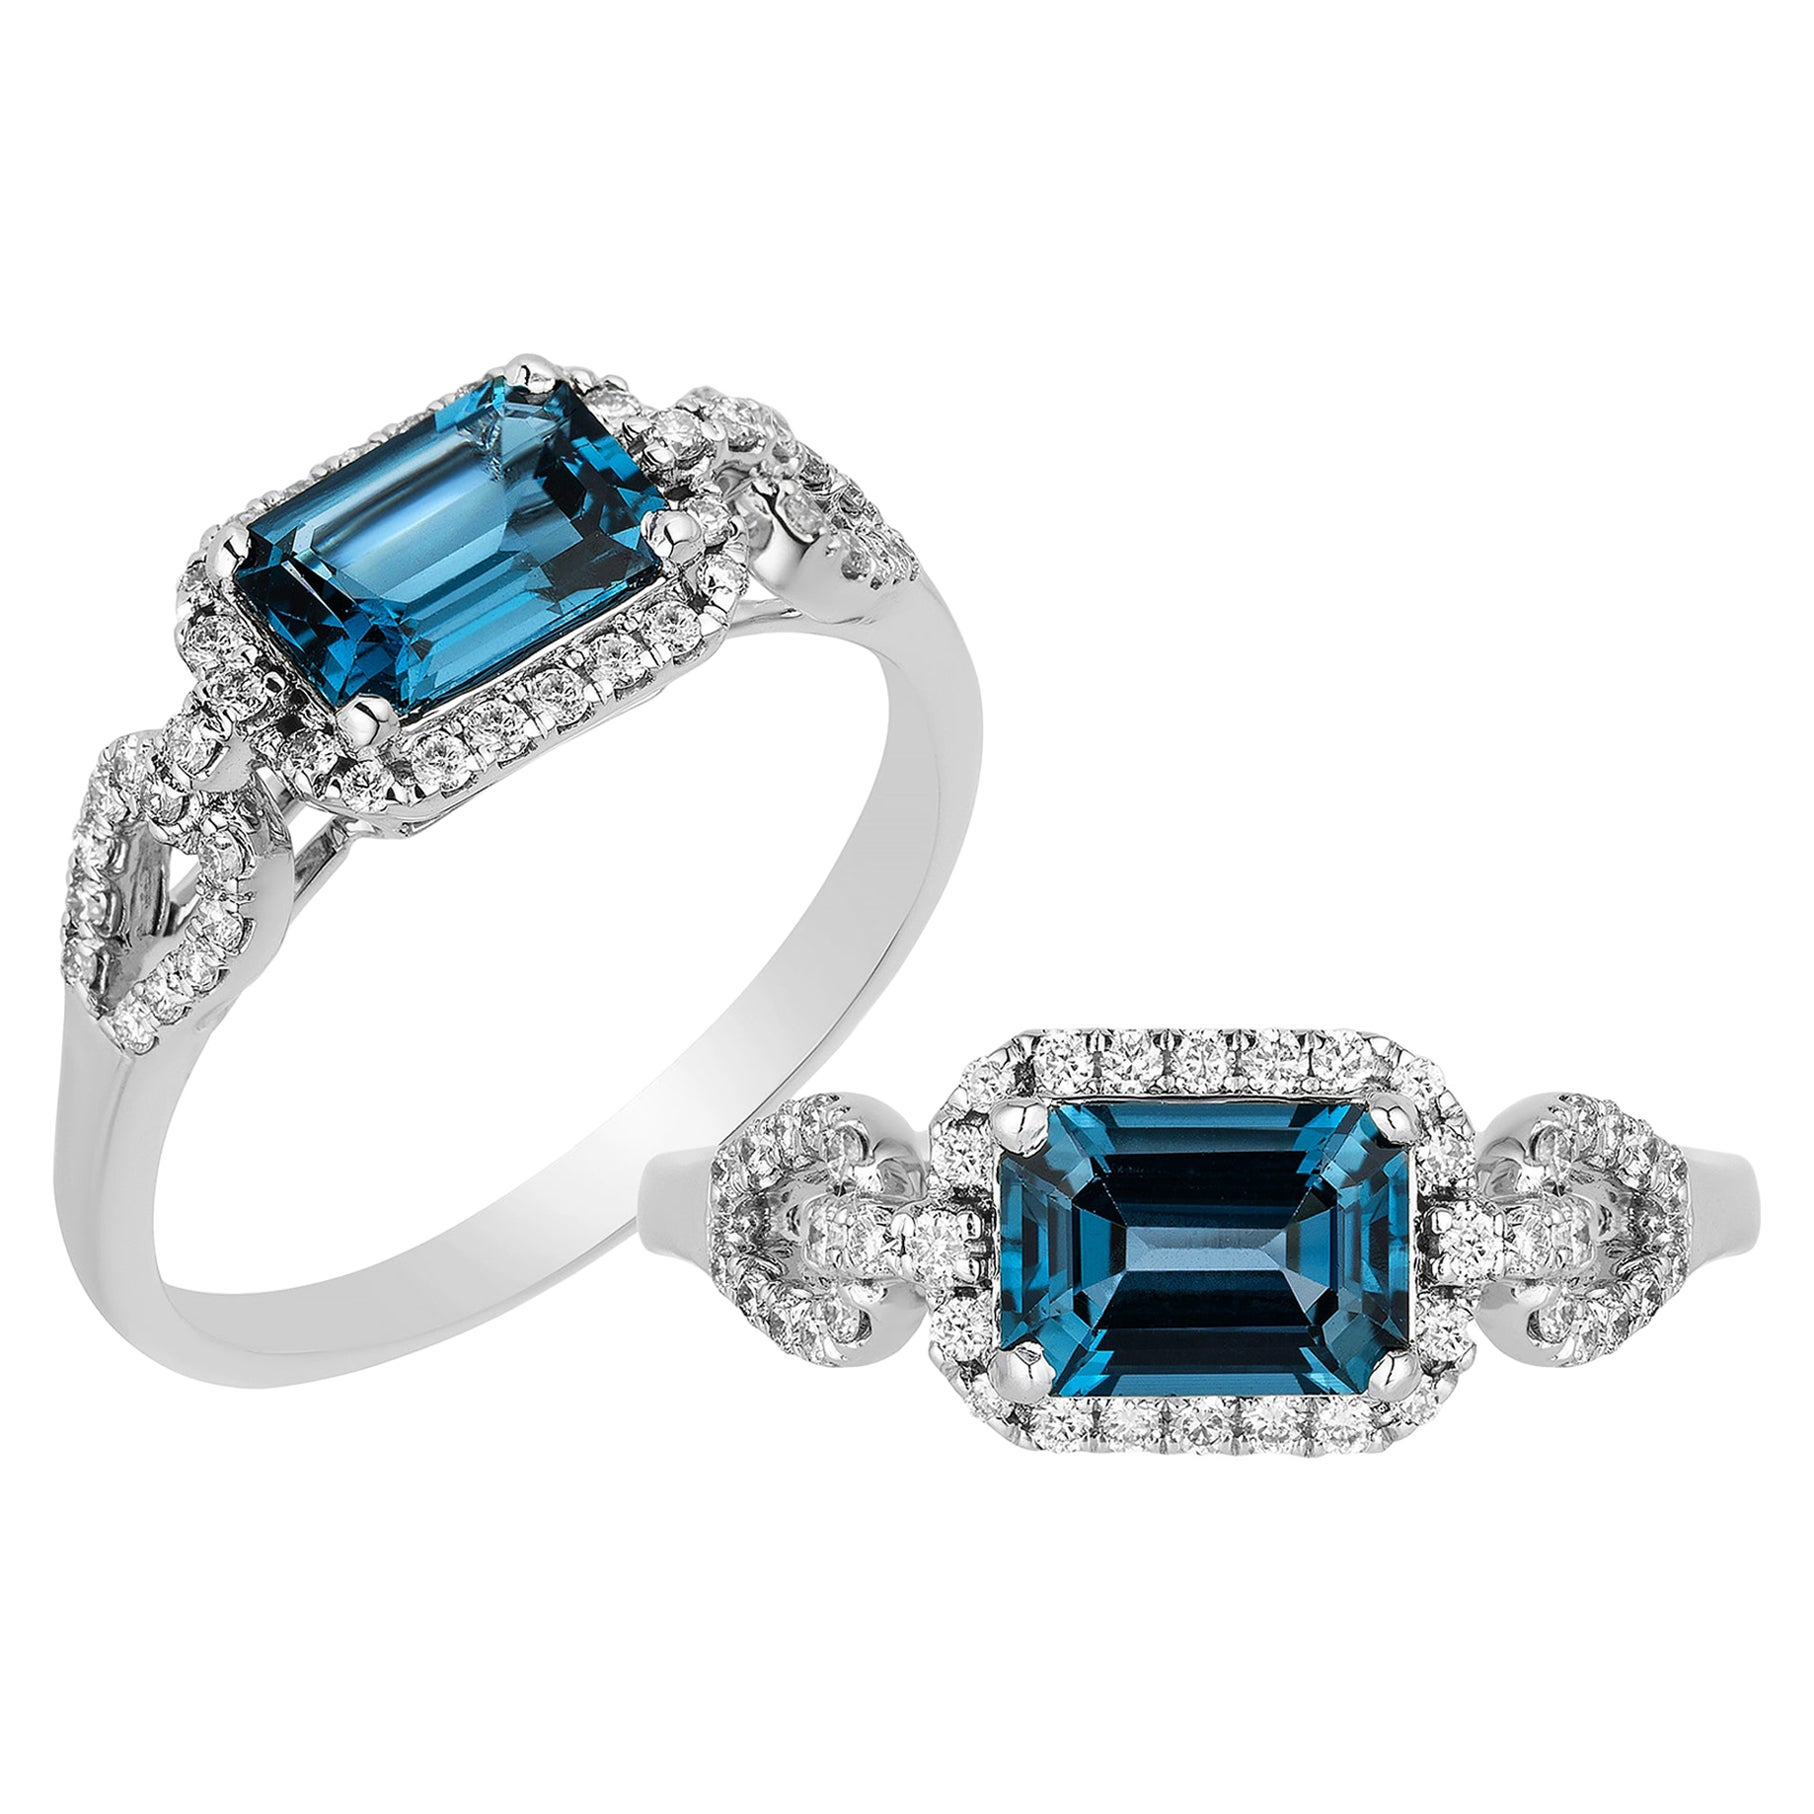 Goshwara Emerald Cut London Blue Topaz And Diamond Ring